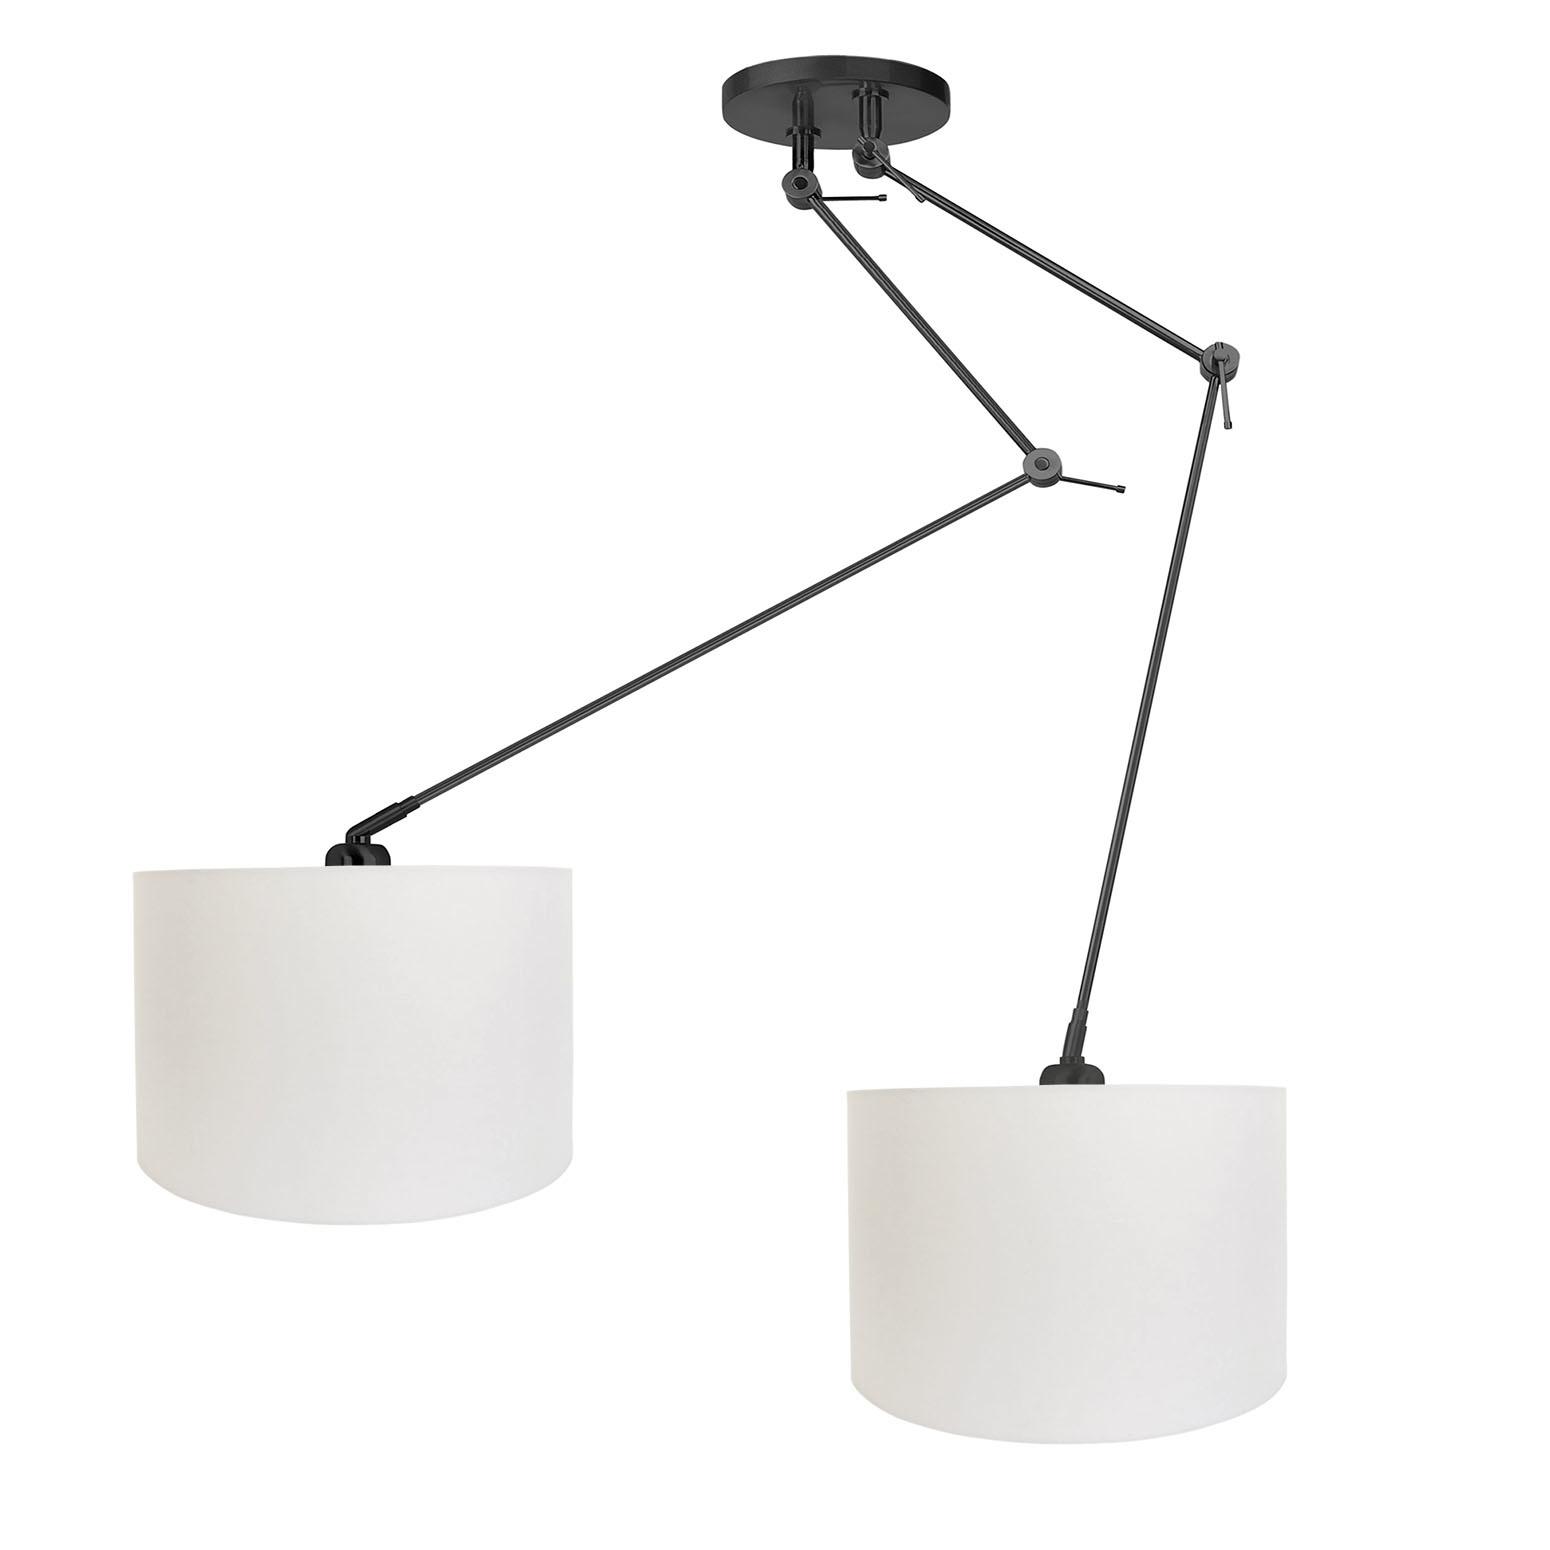 Ylumen Hanglamp Knik 2 lichts met witte kappen Ø 40 cm zwart